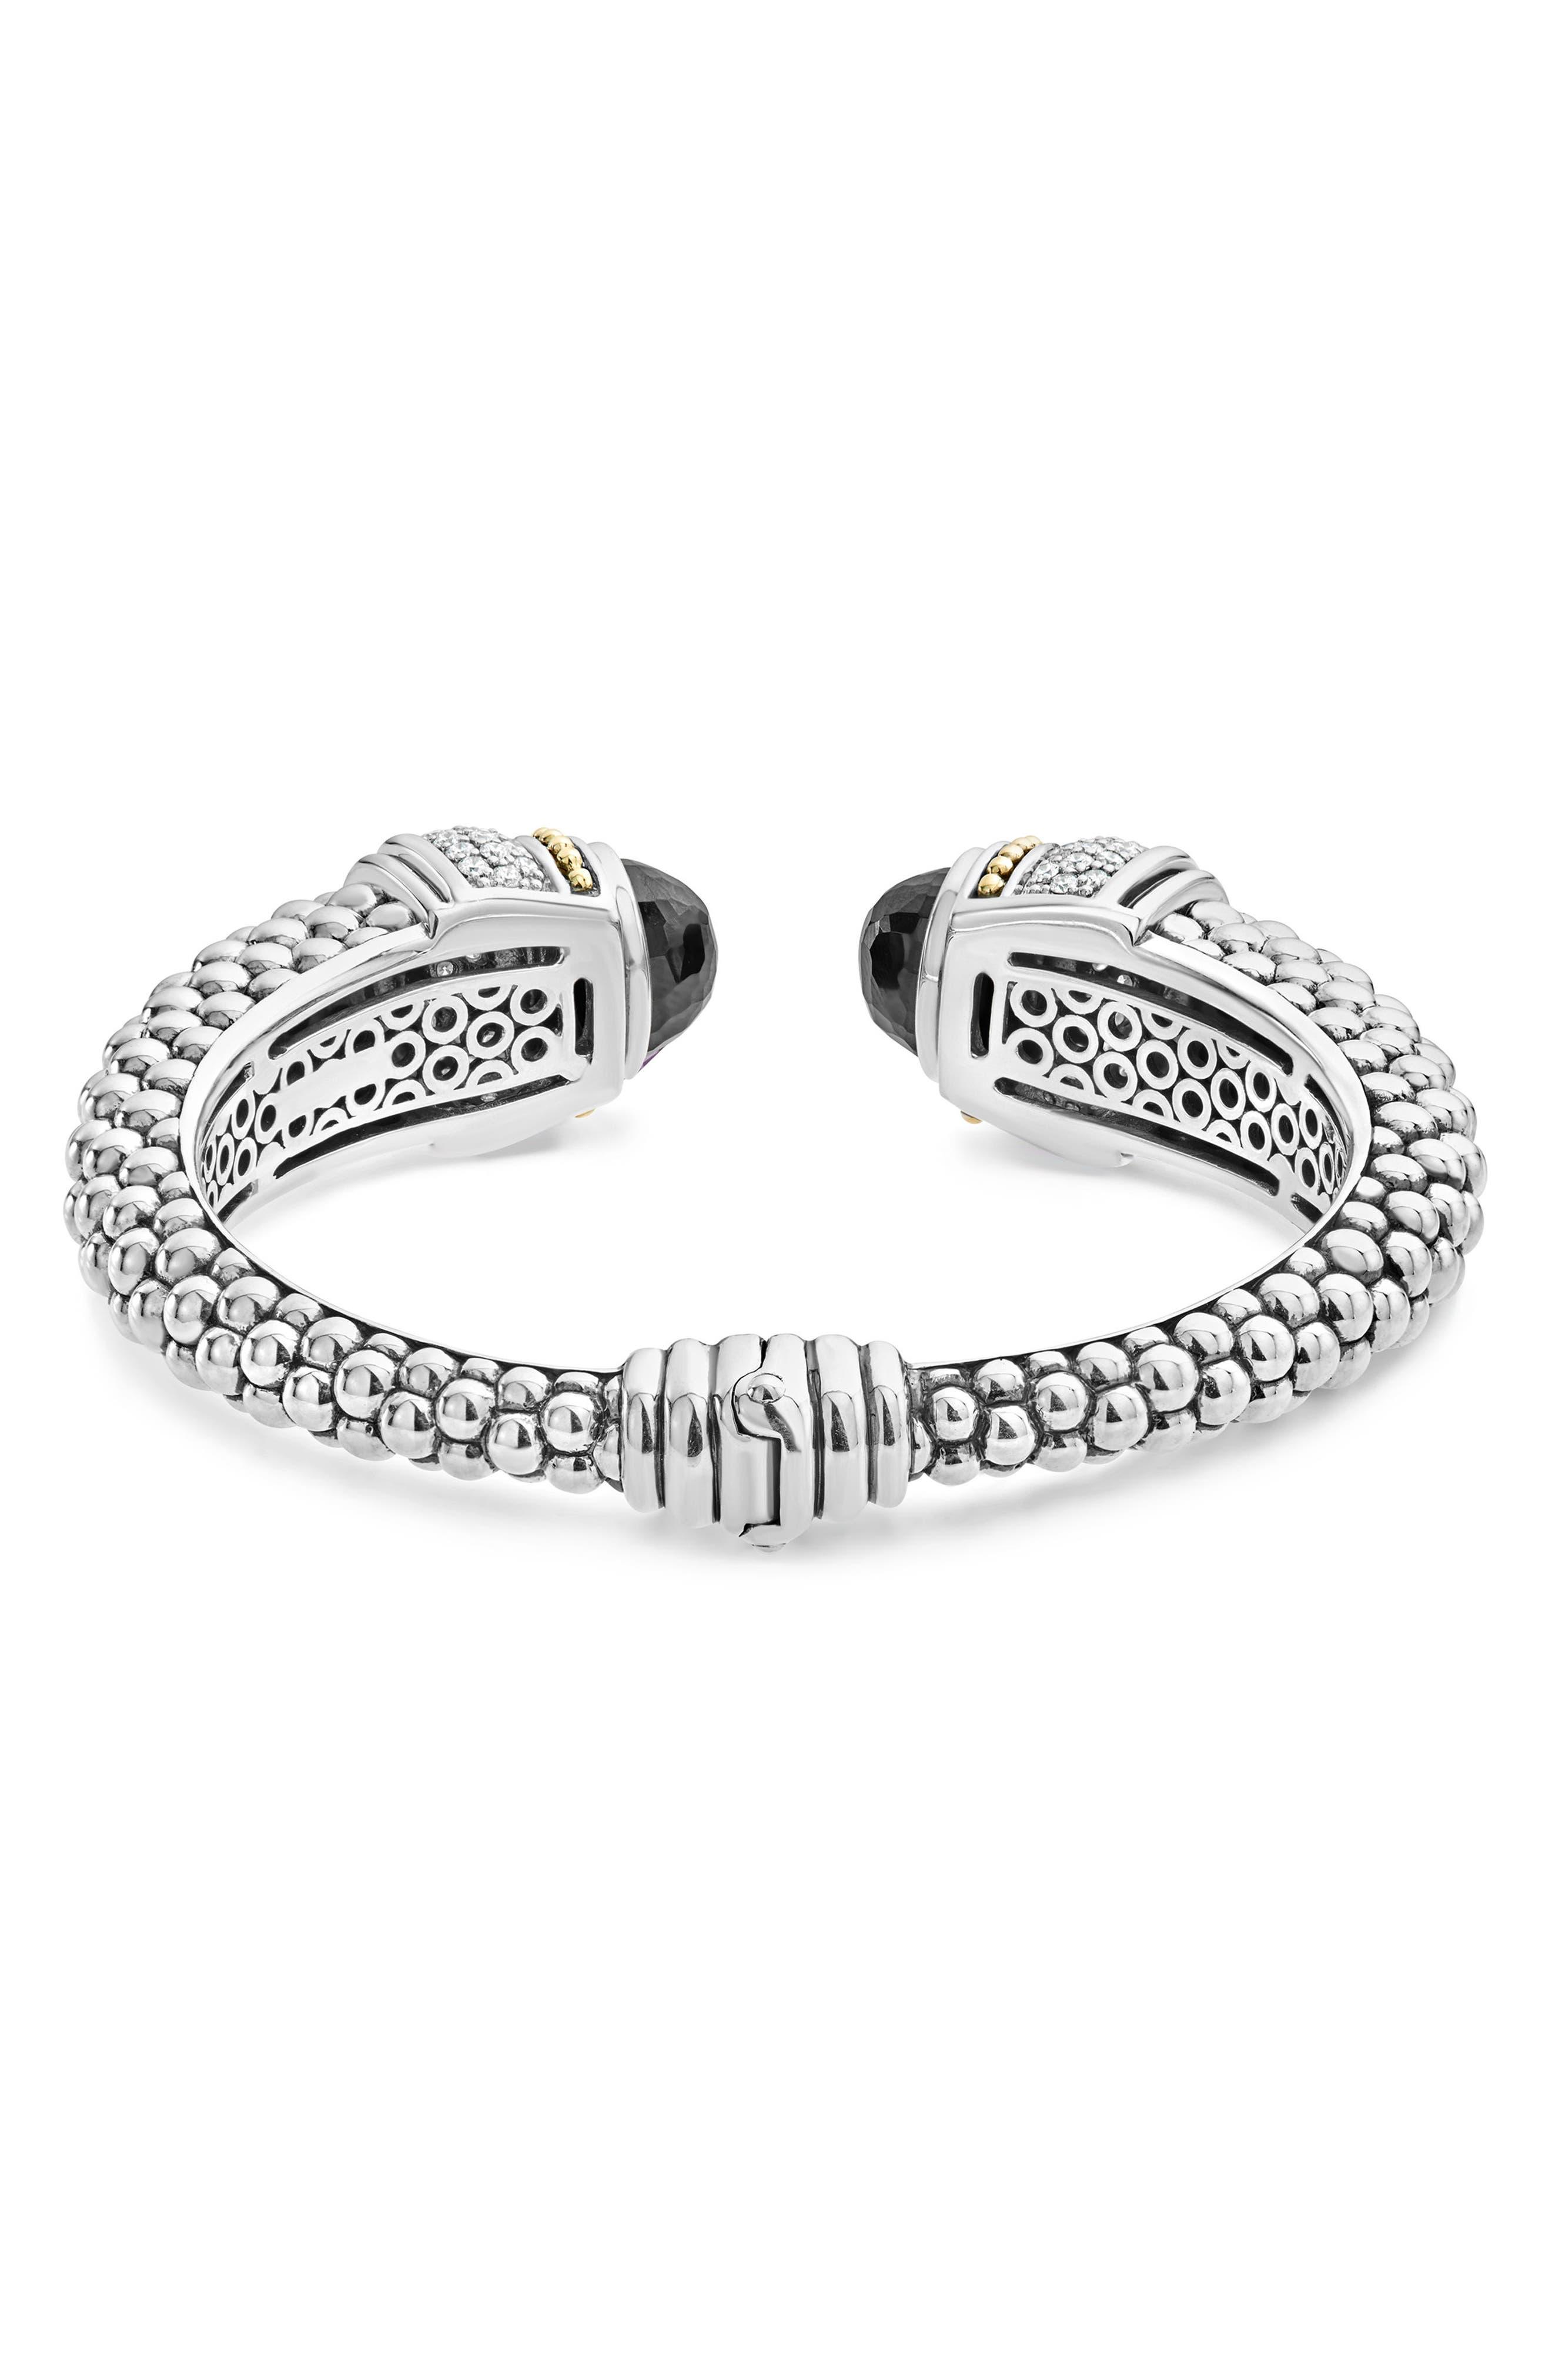 Caviar Diamond & Semiprecious Stone Wrist Cuff,                             Alternate thumbnail 3, color,                             BLACK SPINEL